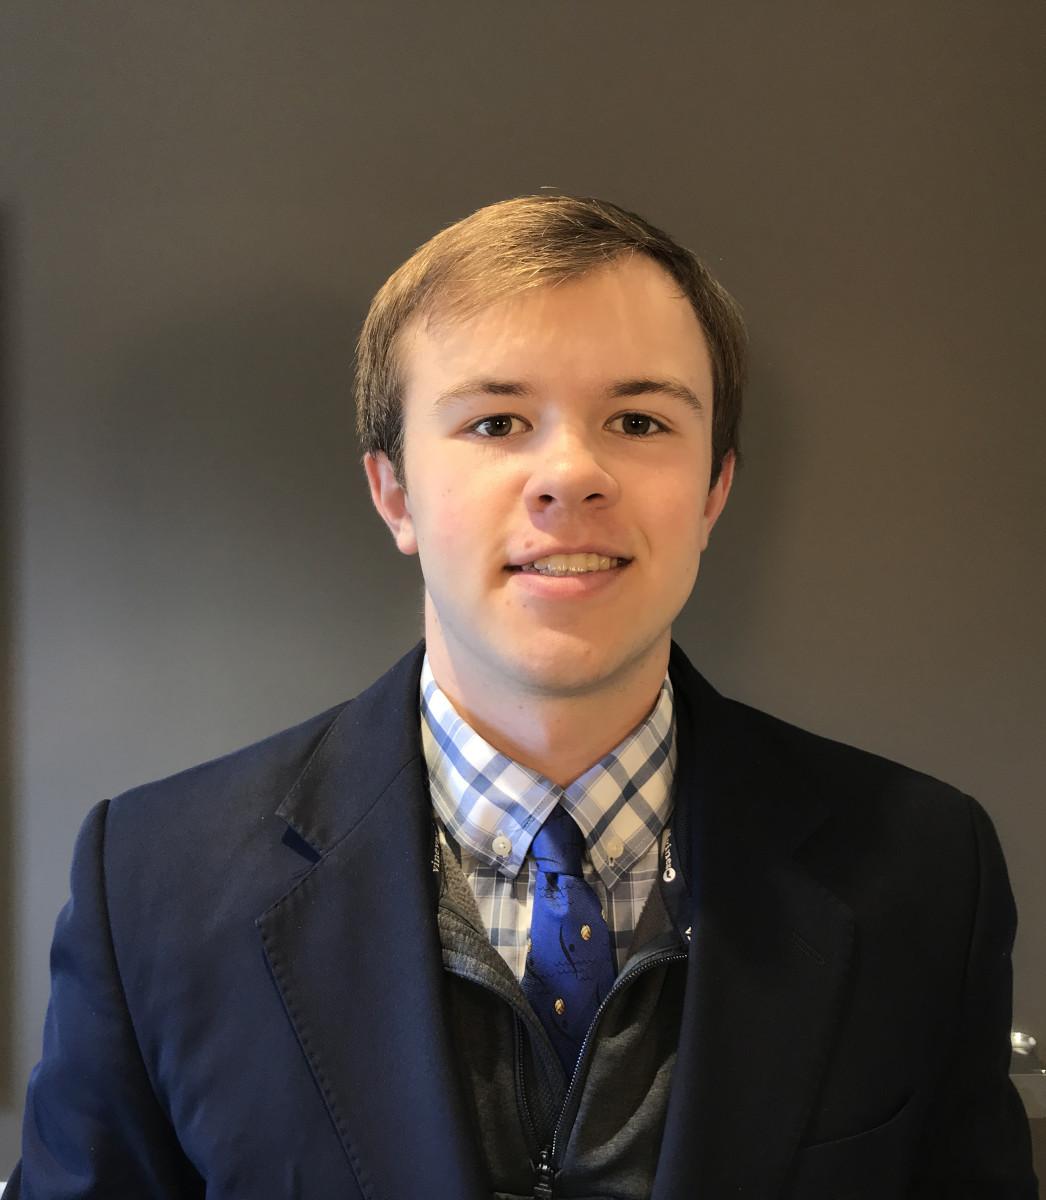 Scholarship winner Christain Hartch